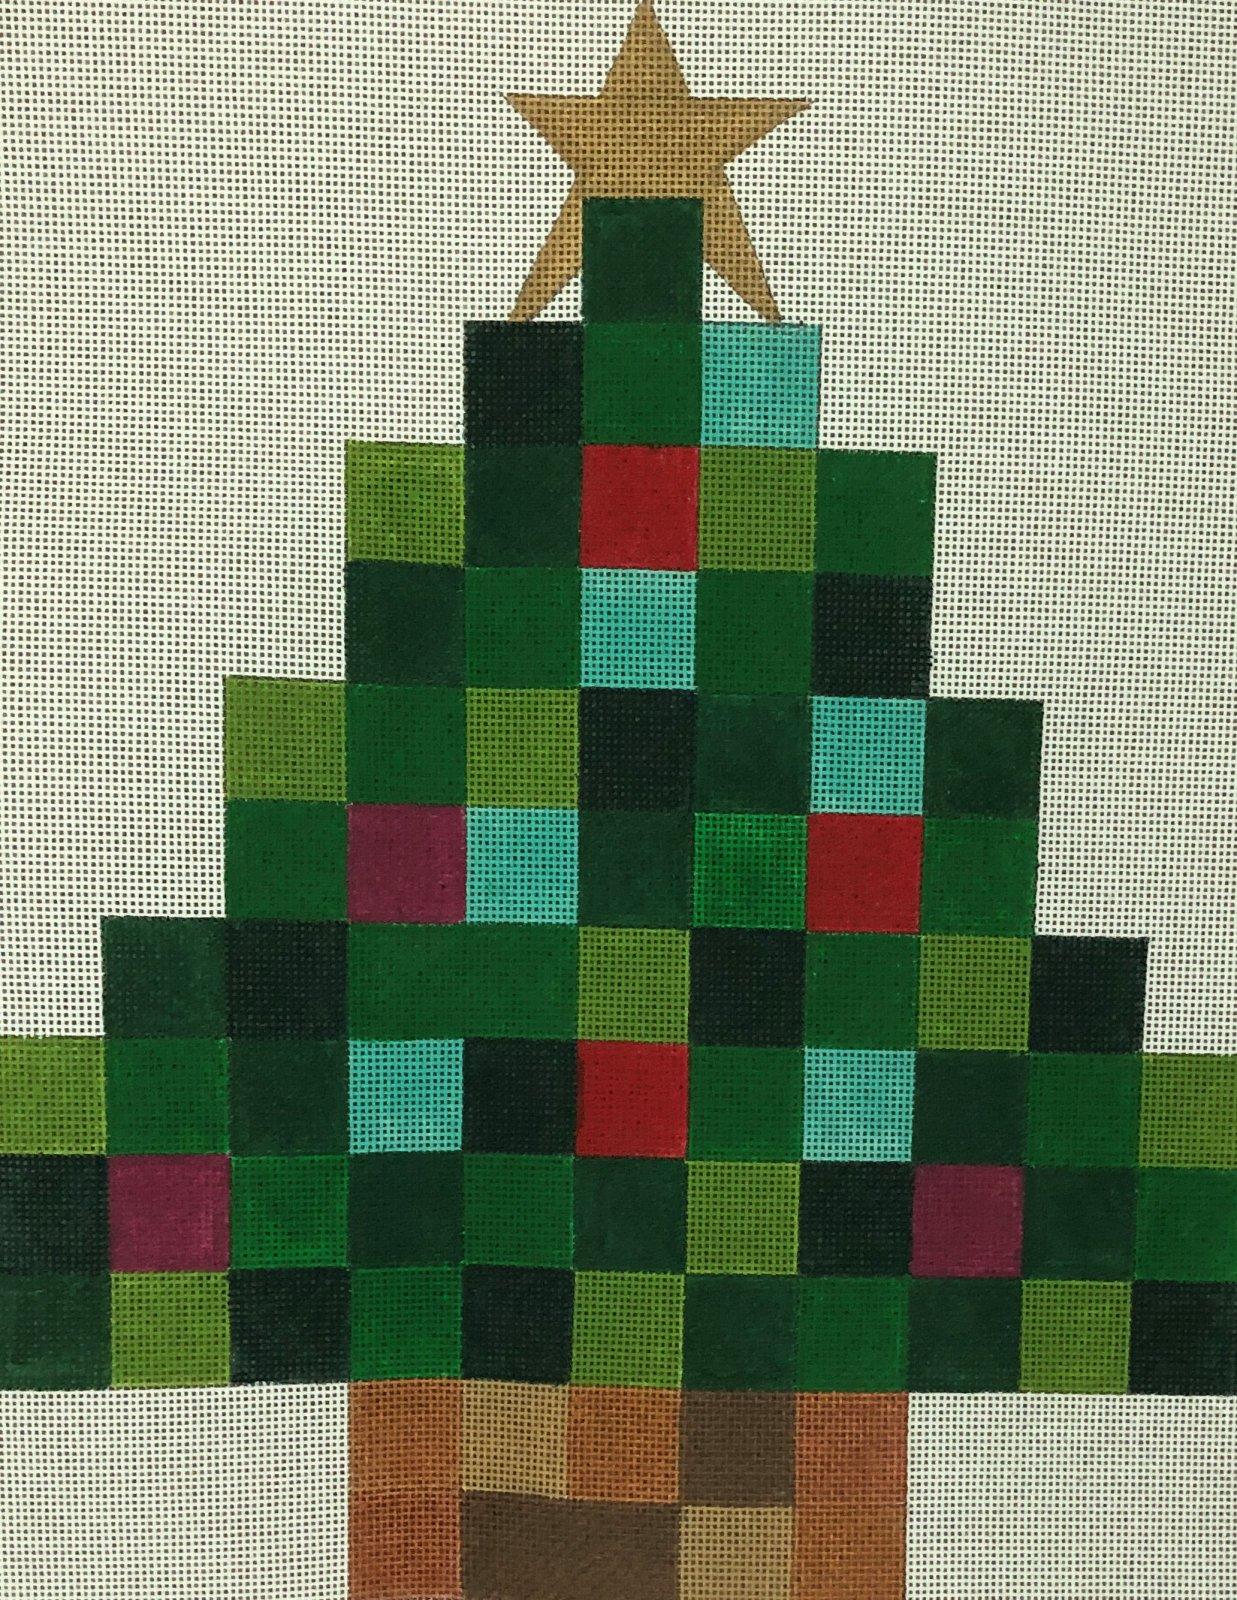 373504 - CHRISTMAS TREE